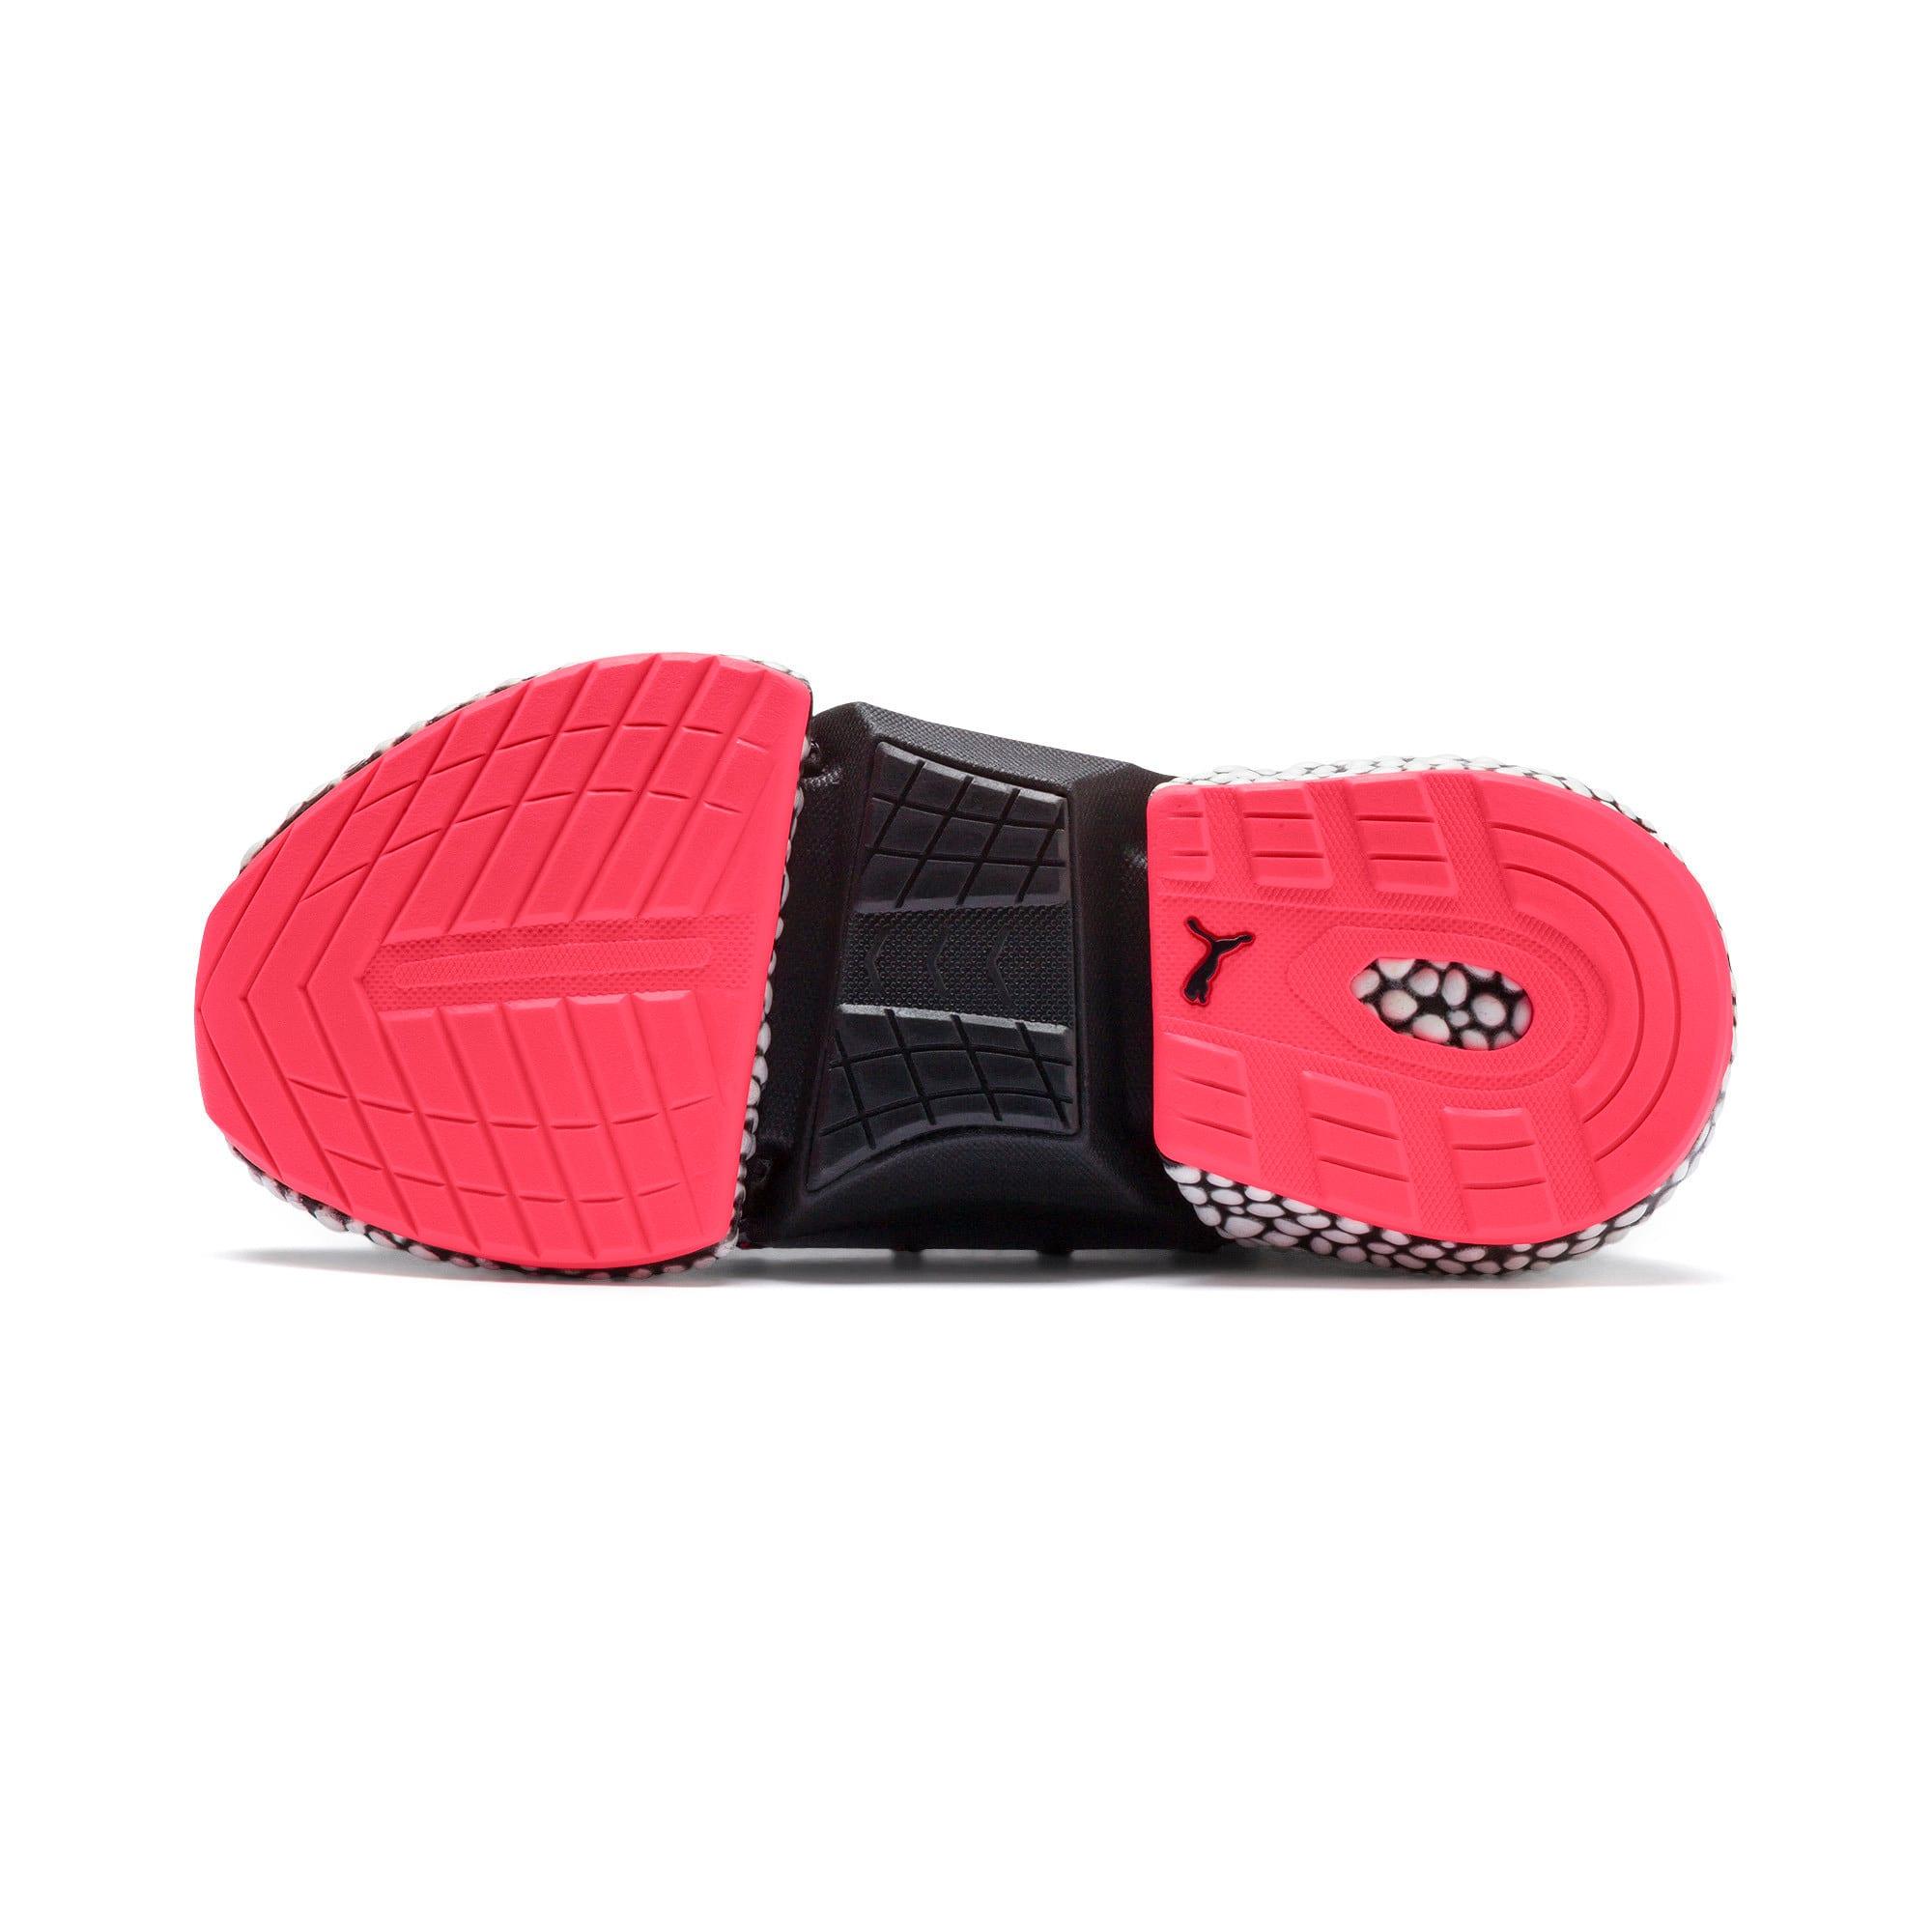 Thumbnail 5 of HYBRID Rocket Aero Women's Sneakers, Puma Black-Pink Alert, medium